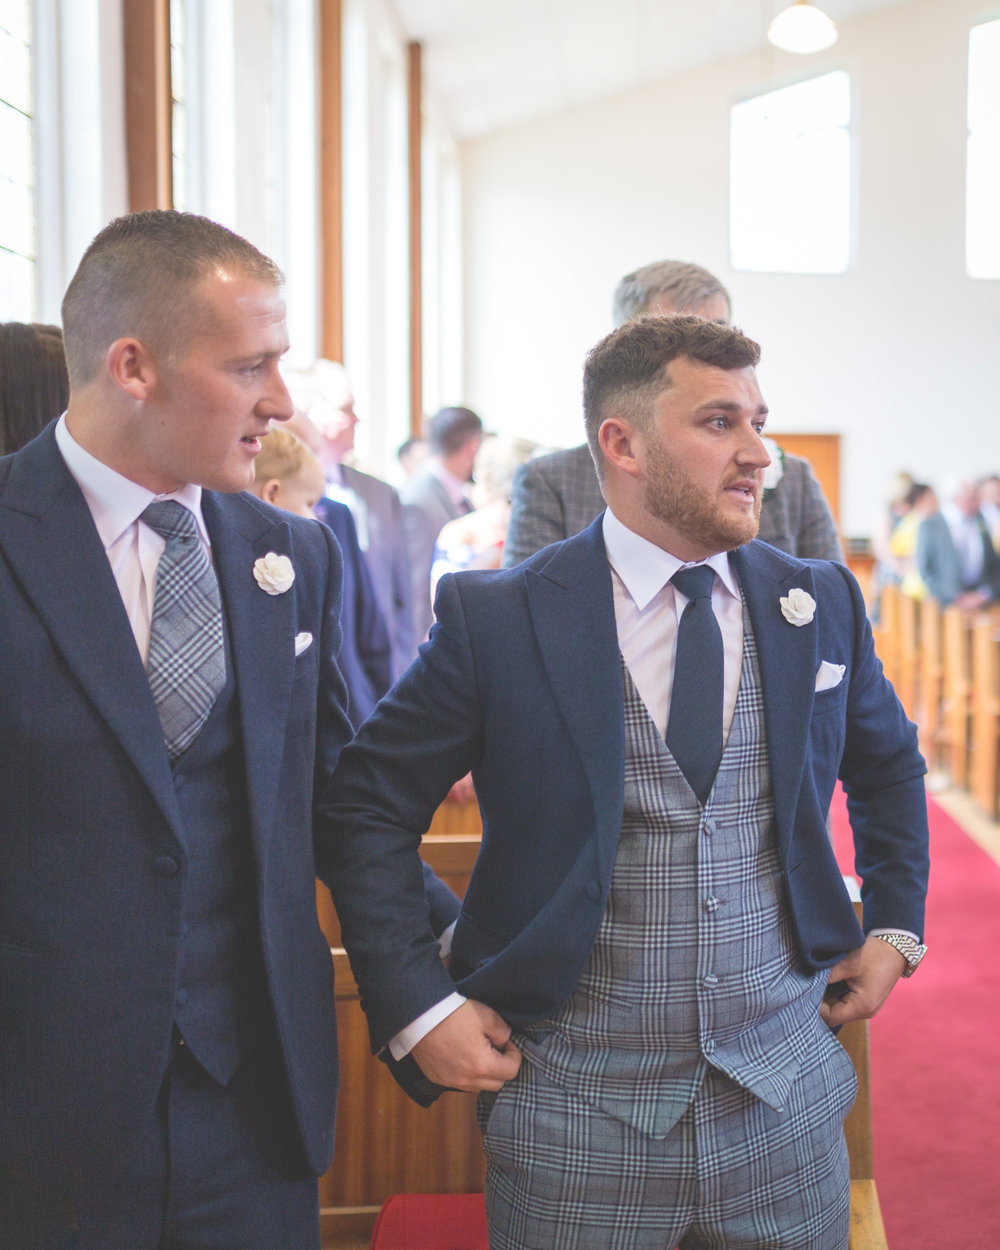 Brian McEwan | Northern Ireland Wedding Photographer | Rebecca & Michael | Ceremony-11.jpg